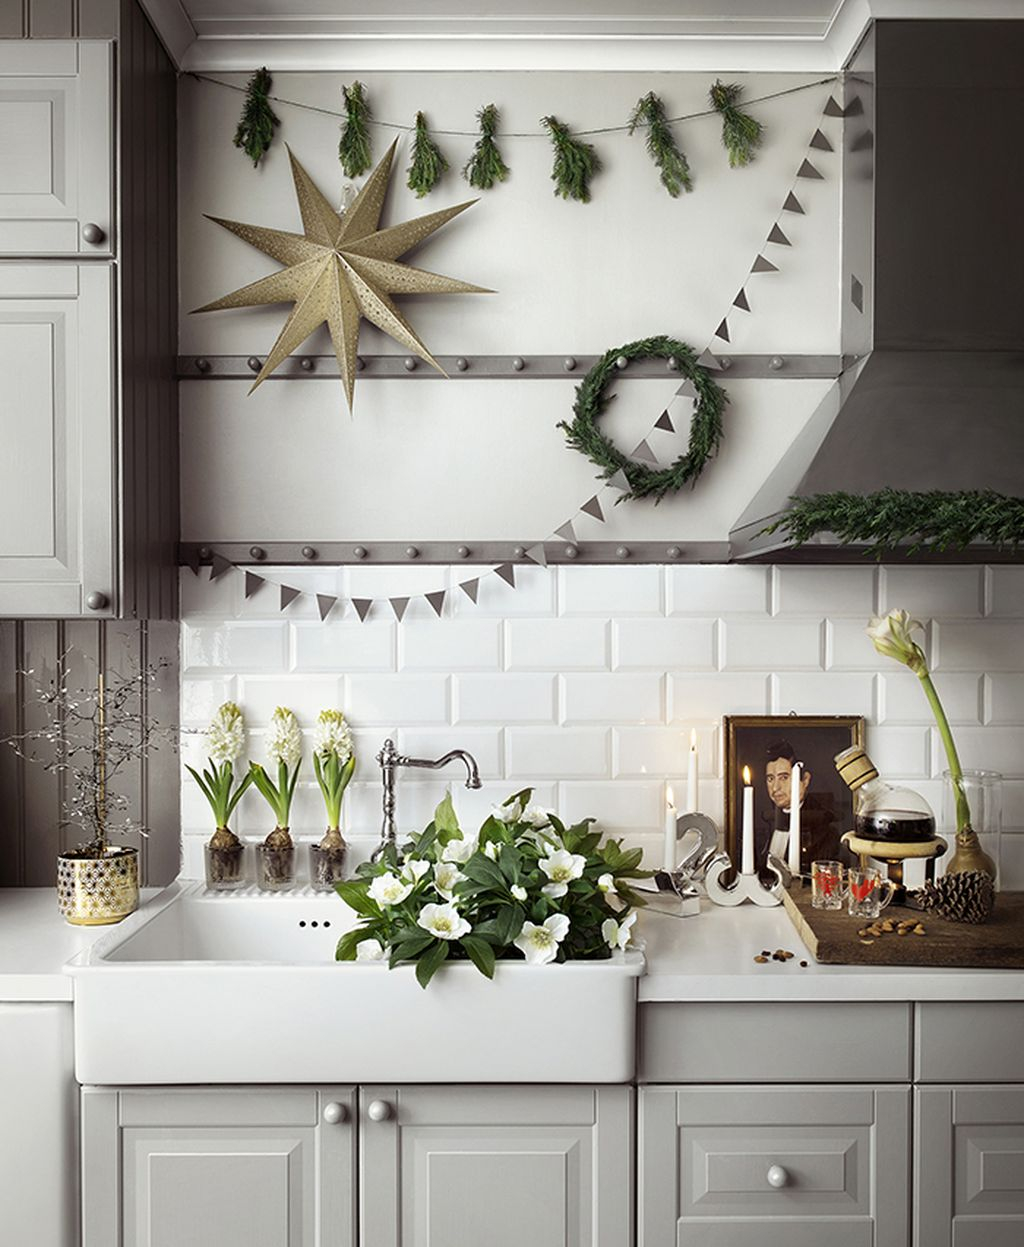 Adorable Rustic Christmas Kitchen Decoration Ideas 10